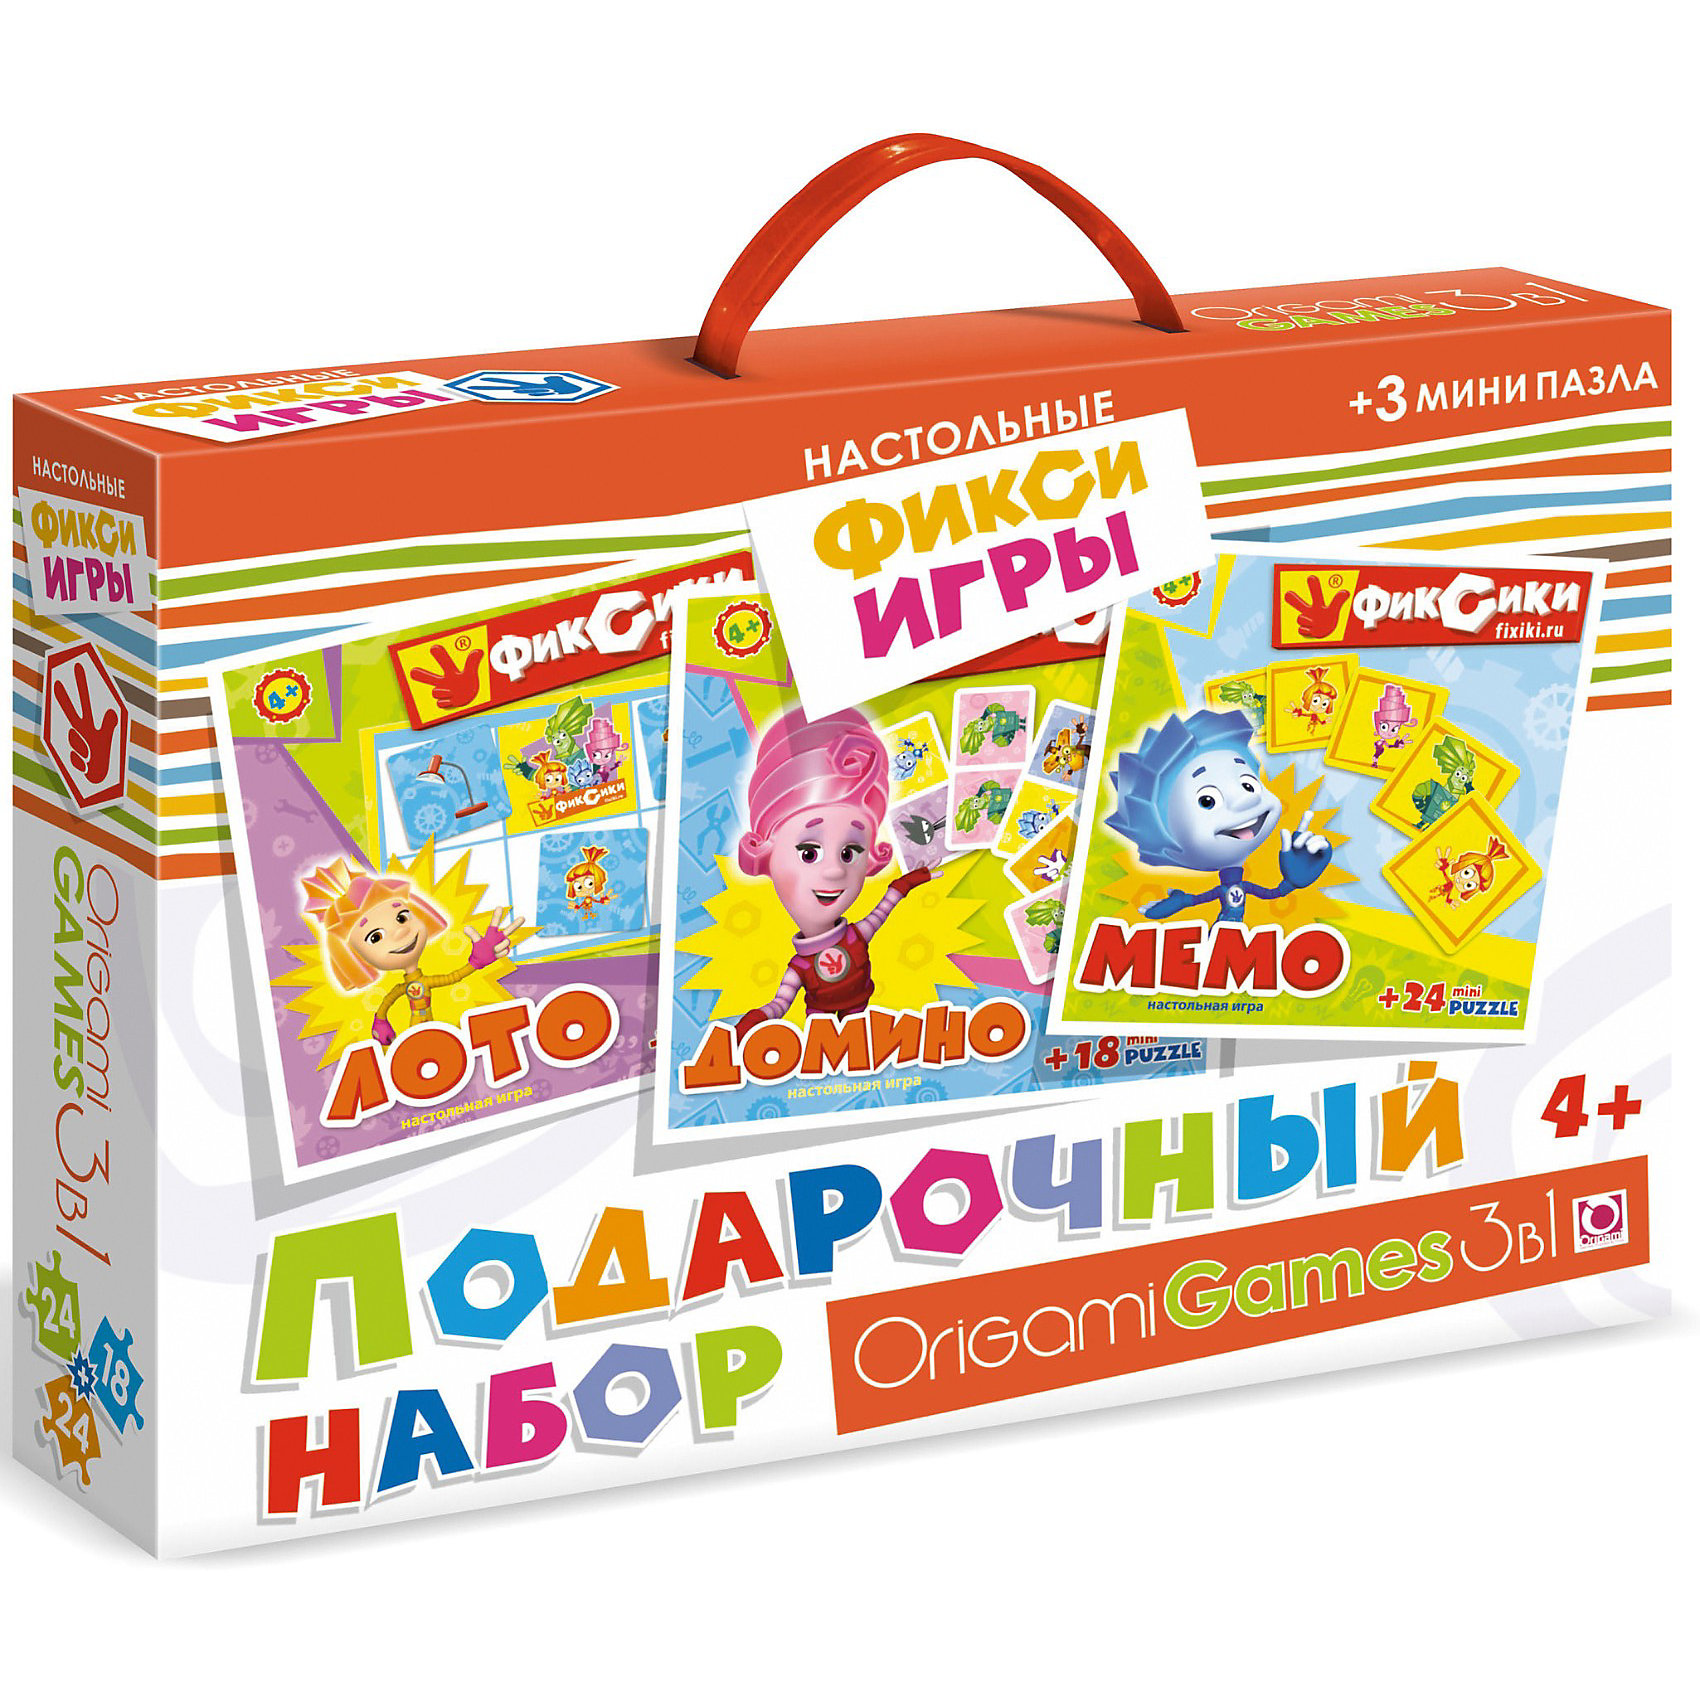 Origami Игра 3 в 1 Лото, домино, мемо + Набор пазлов 24*18*24 деталей, Фиксики подарочный набор 3в1 фиксики 00384